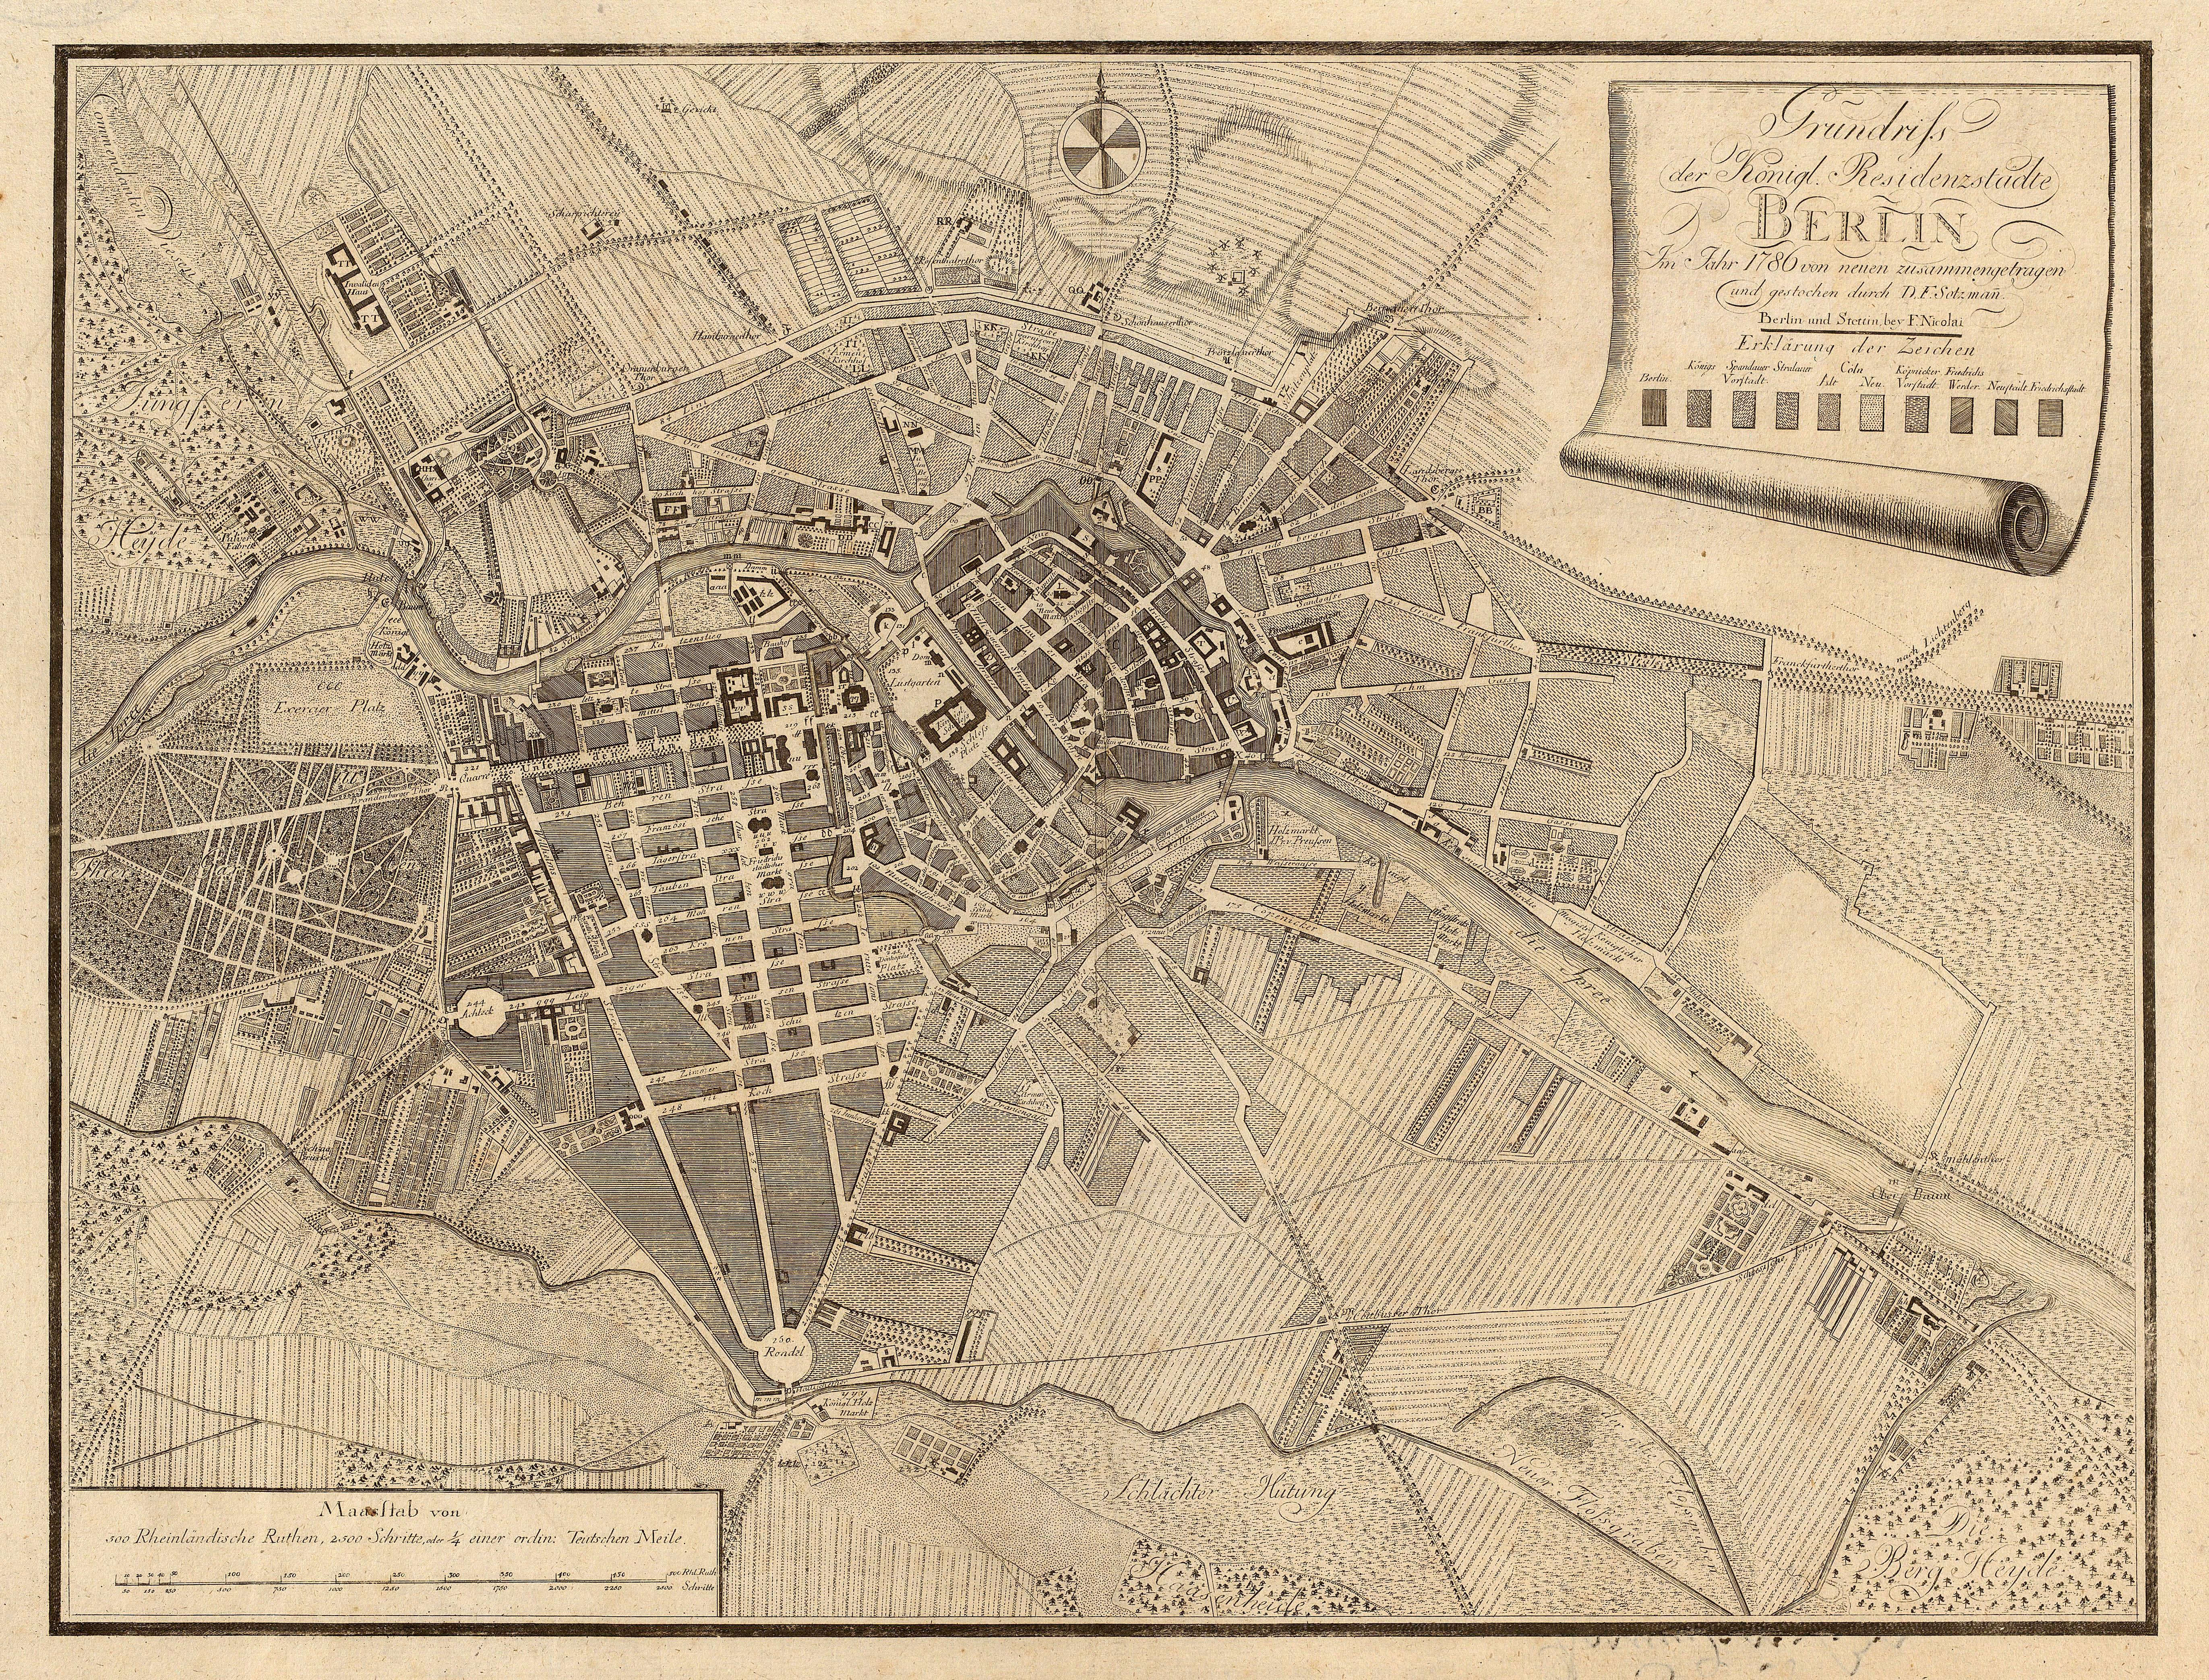 File:Sotzmann Berlin 1786.jpg